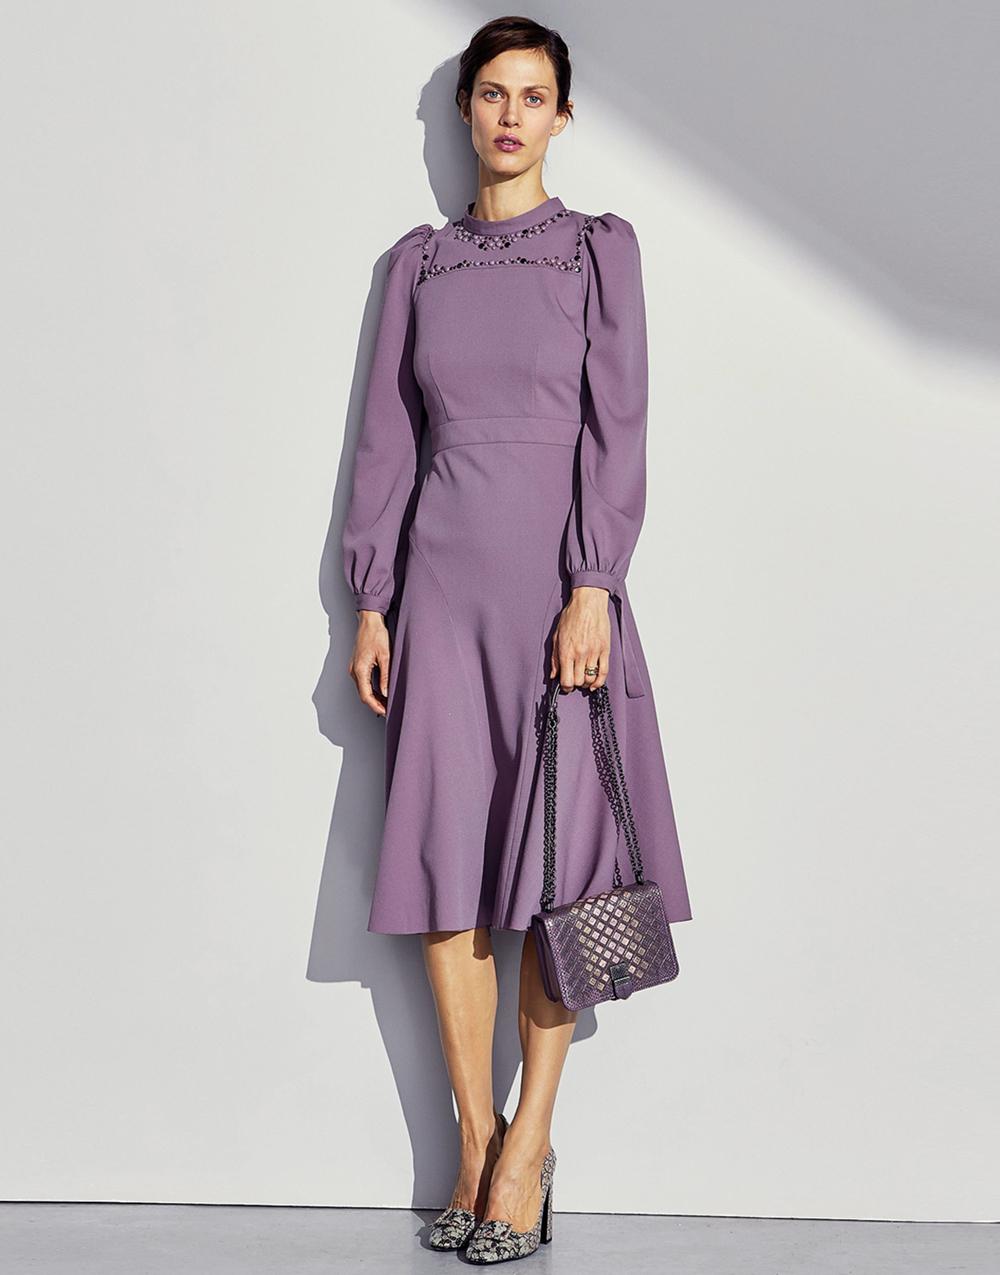 Modelirovanie платья прямые короткие